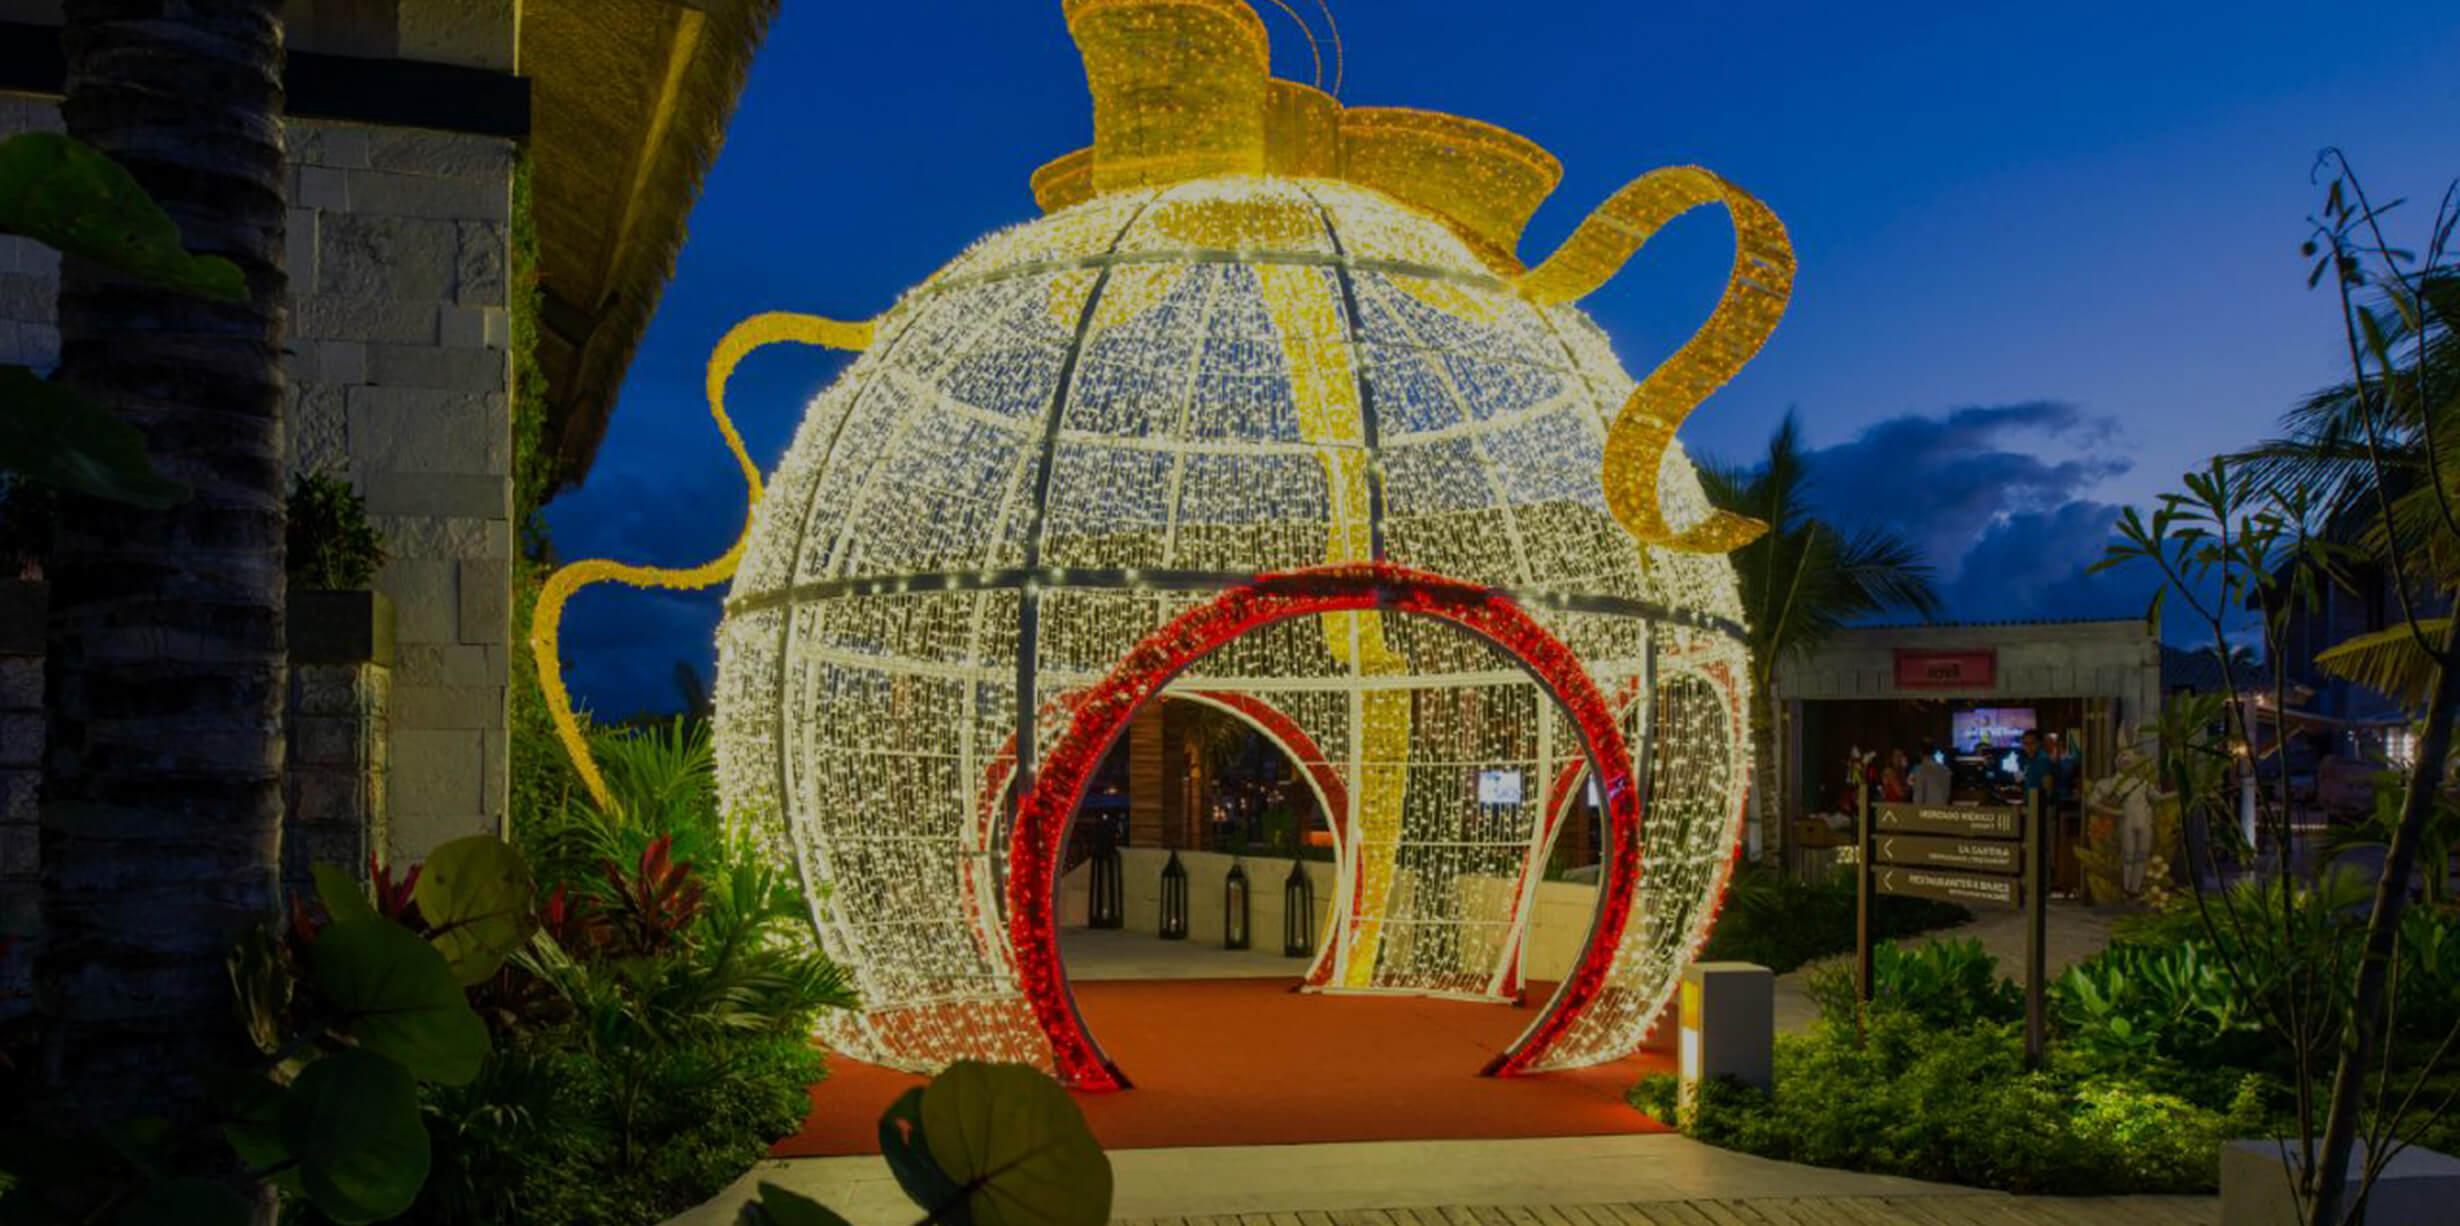 5 Ways to Celebrate the Holidays at Vidanta